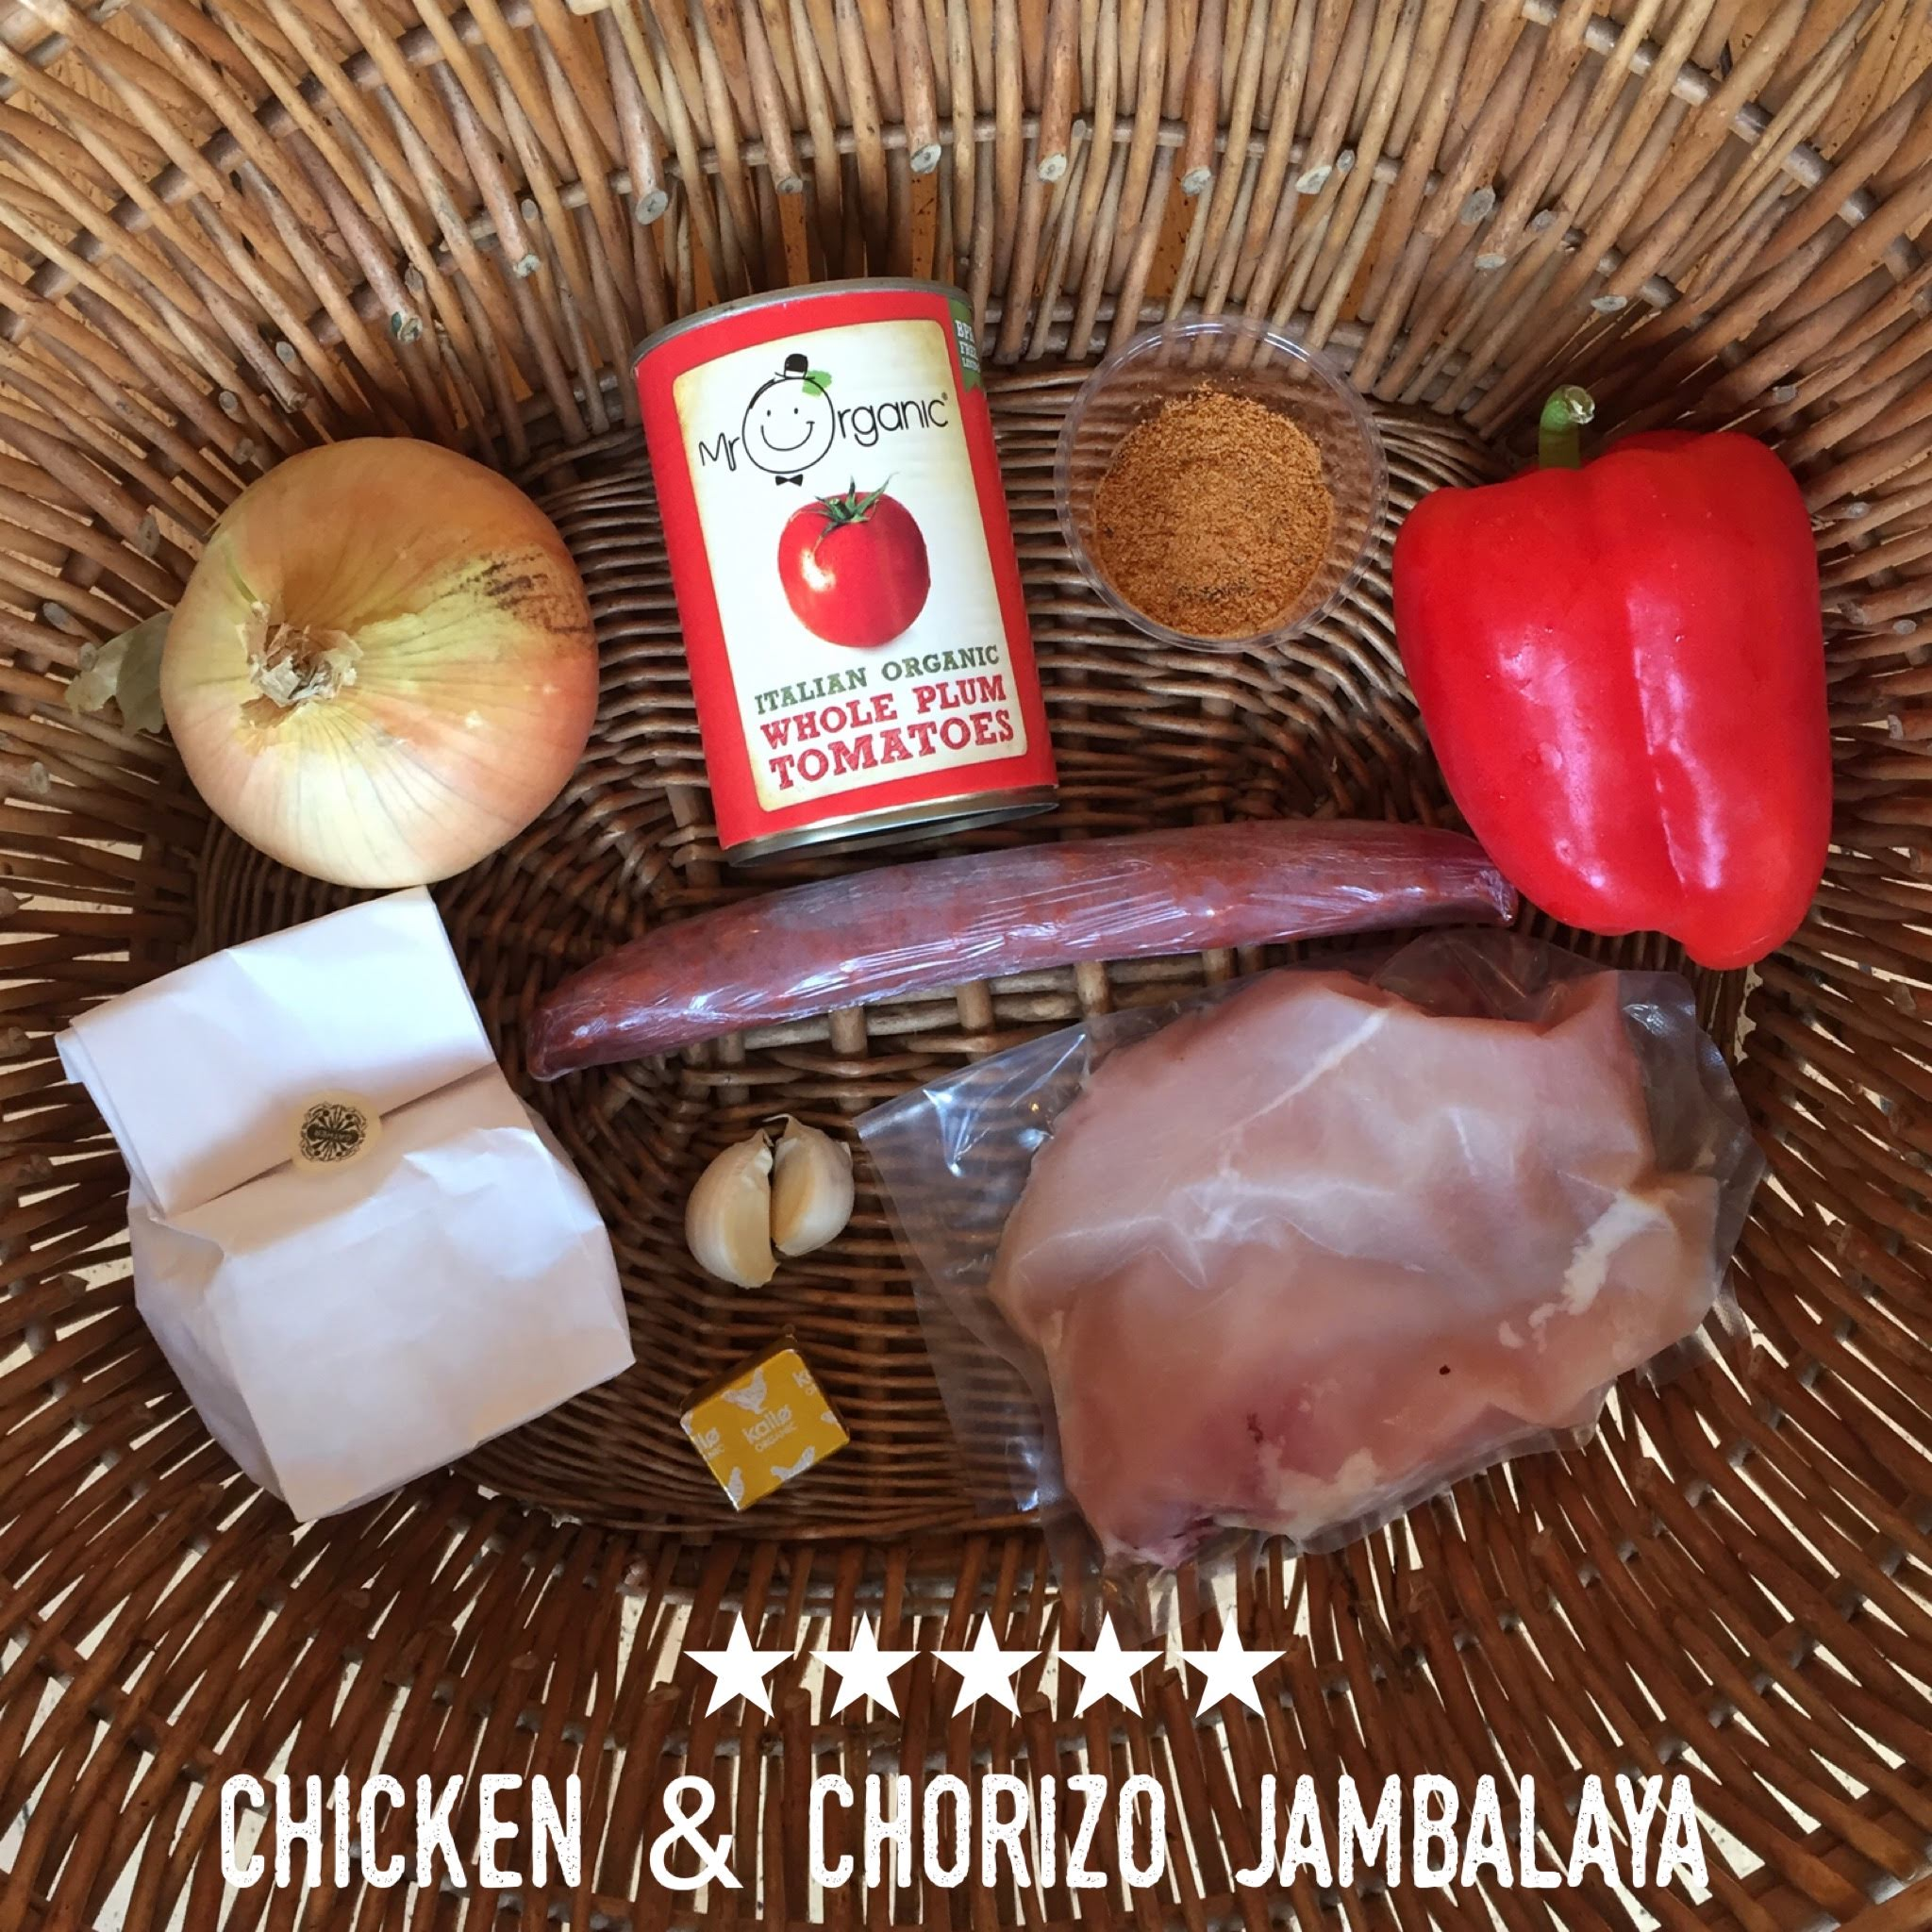 Chicken & Chorizo Jambalaya Meal Bag